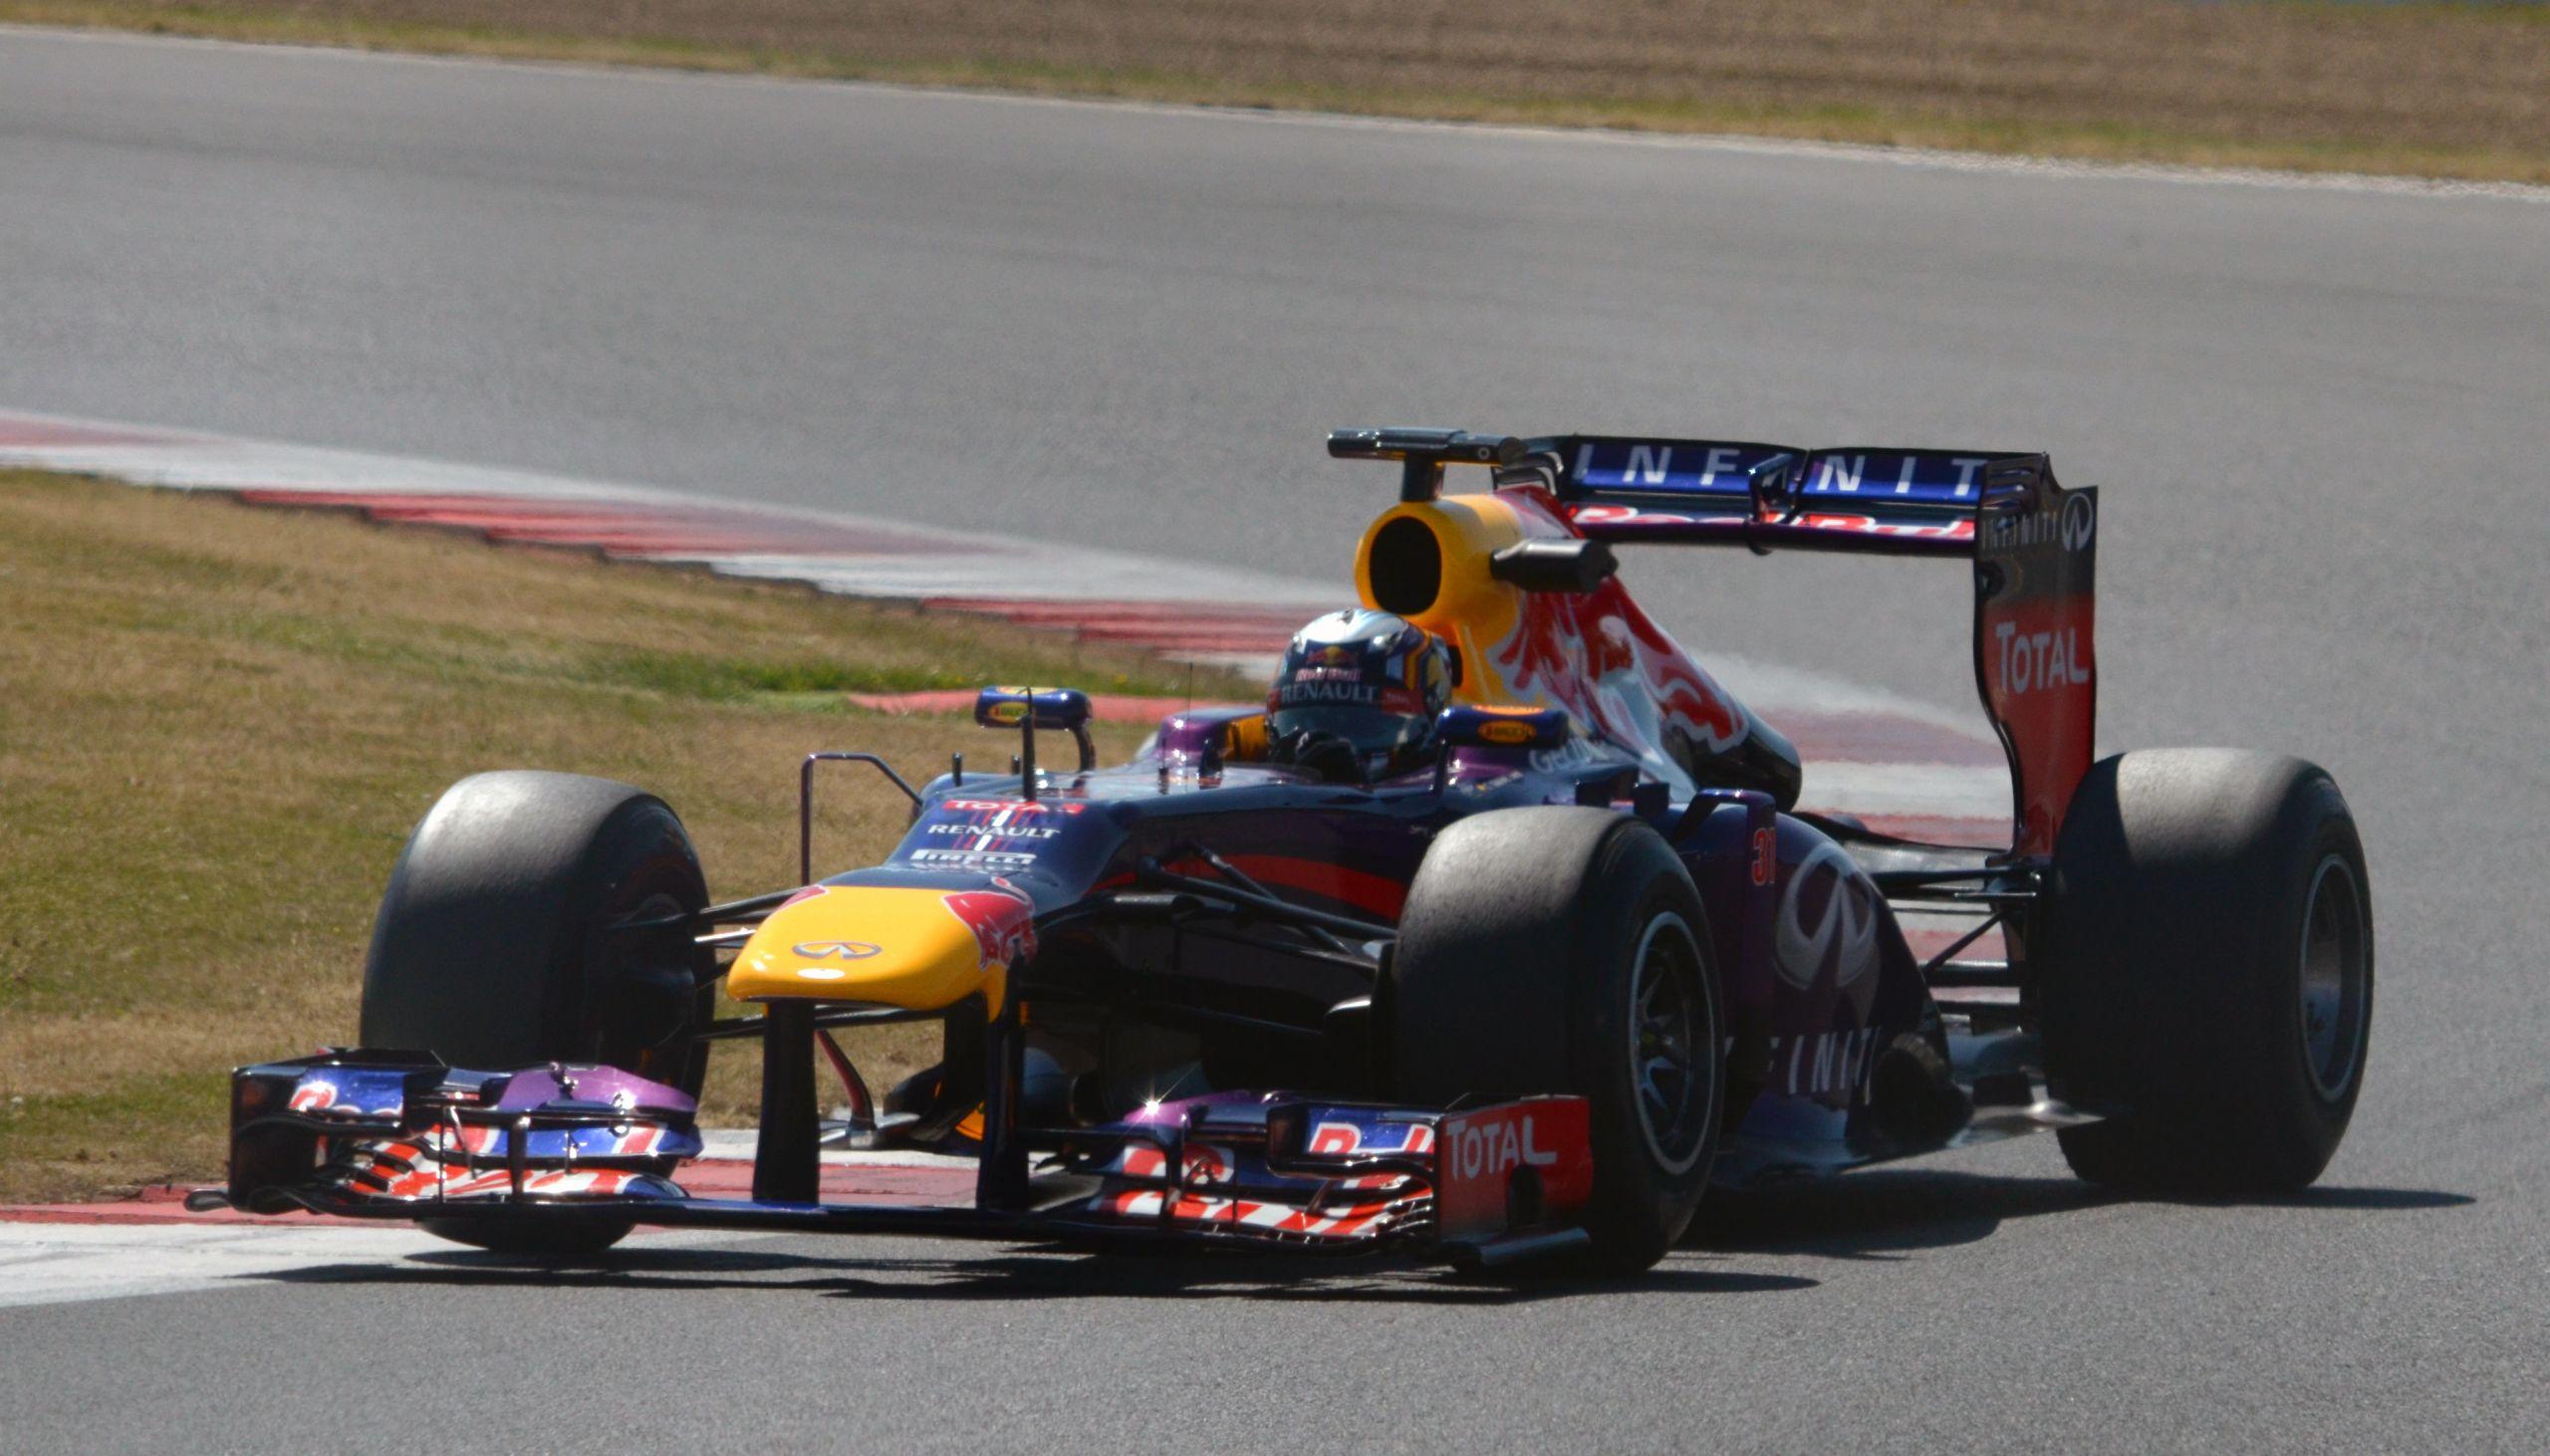 Carlos Sainz Jr Red Bull Racing 2013 Silverstone F1 Test 001